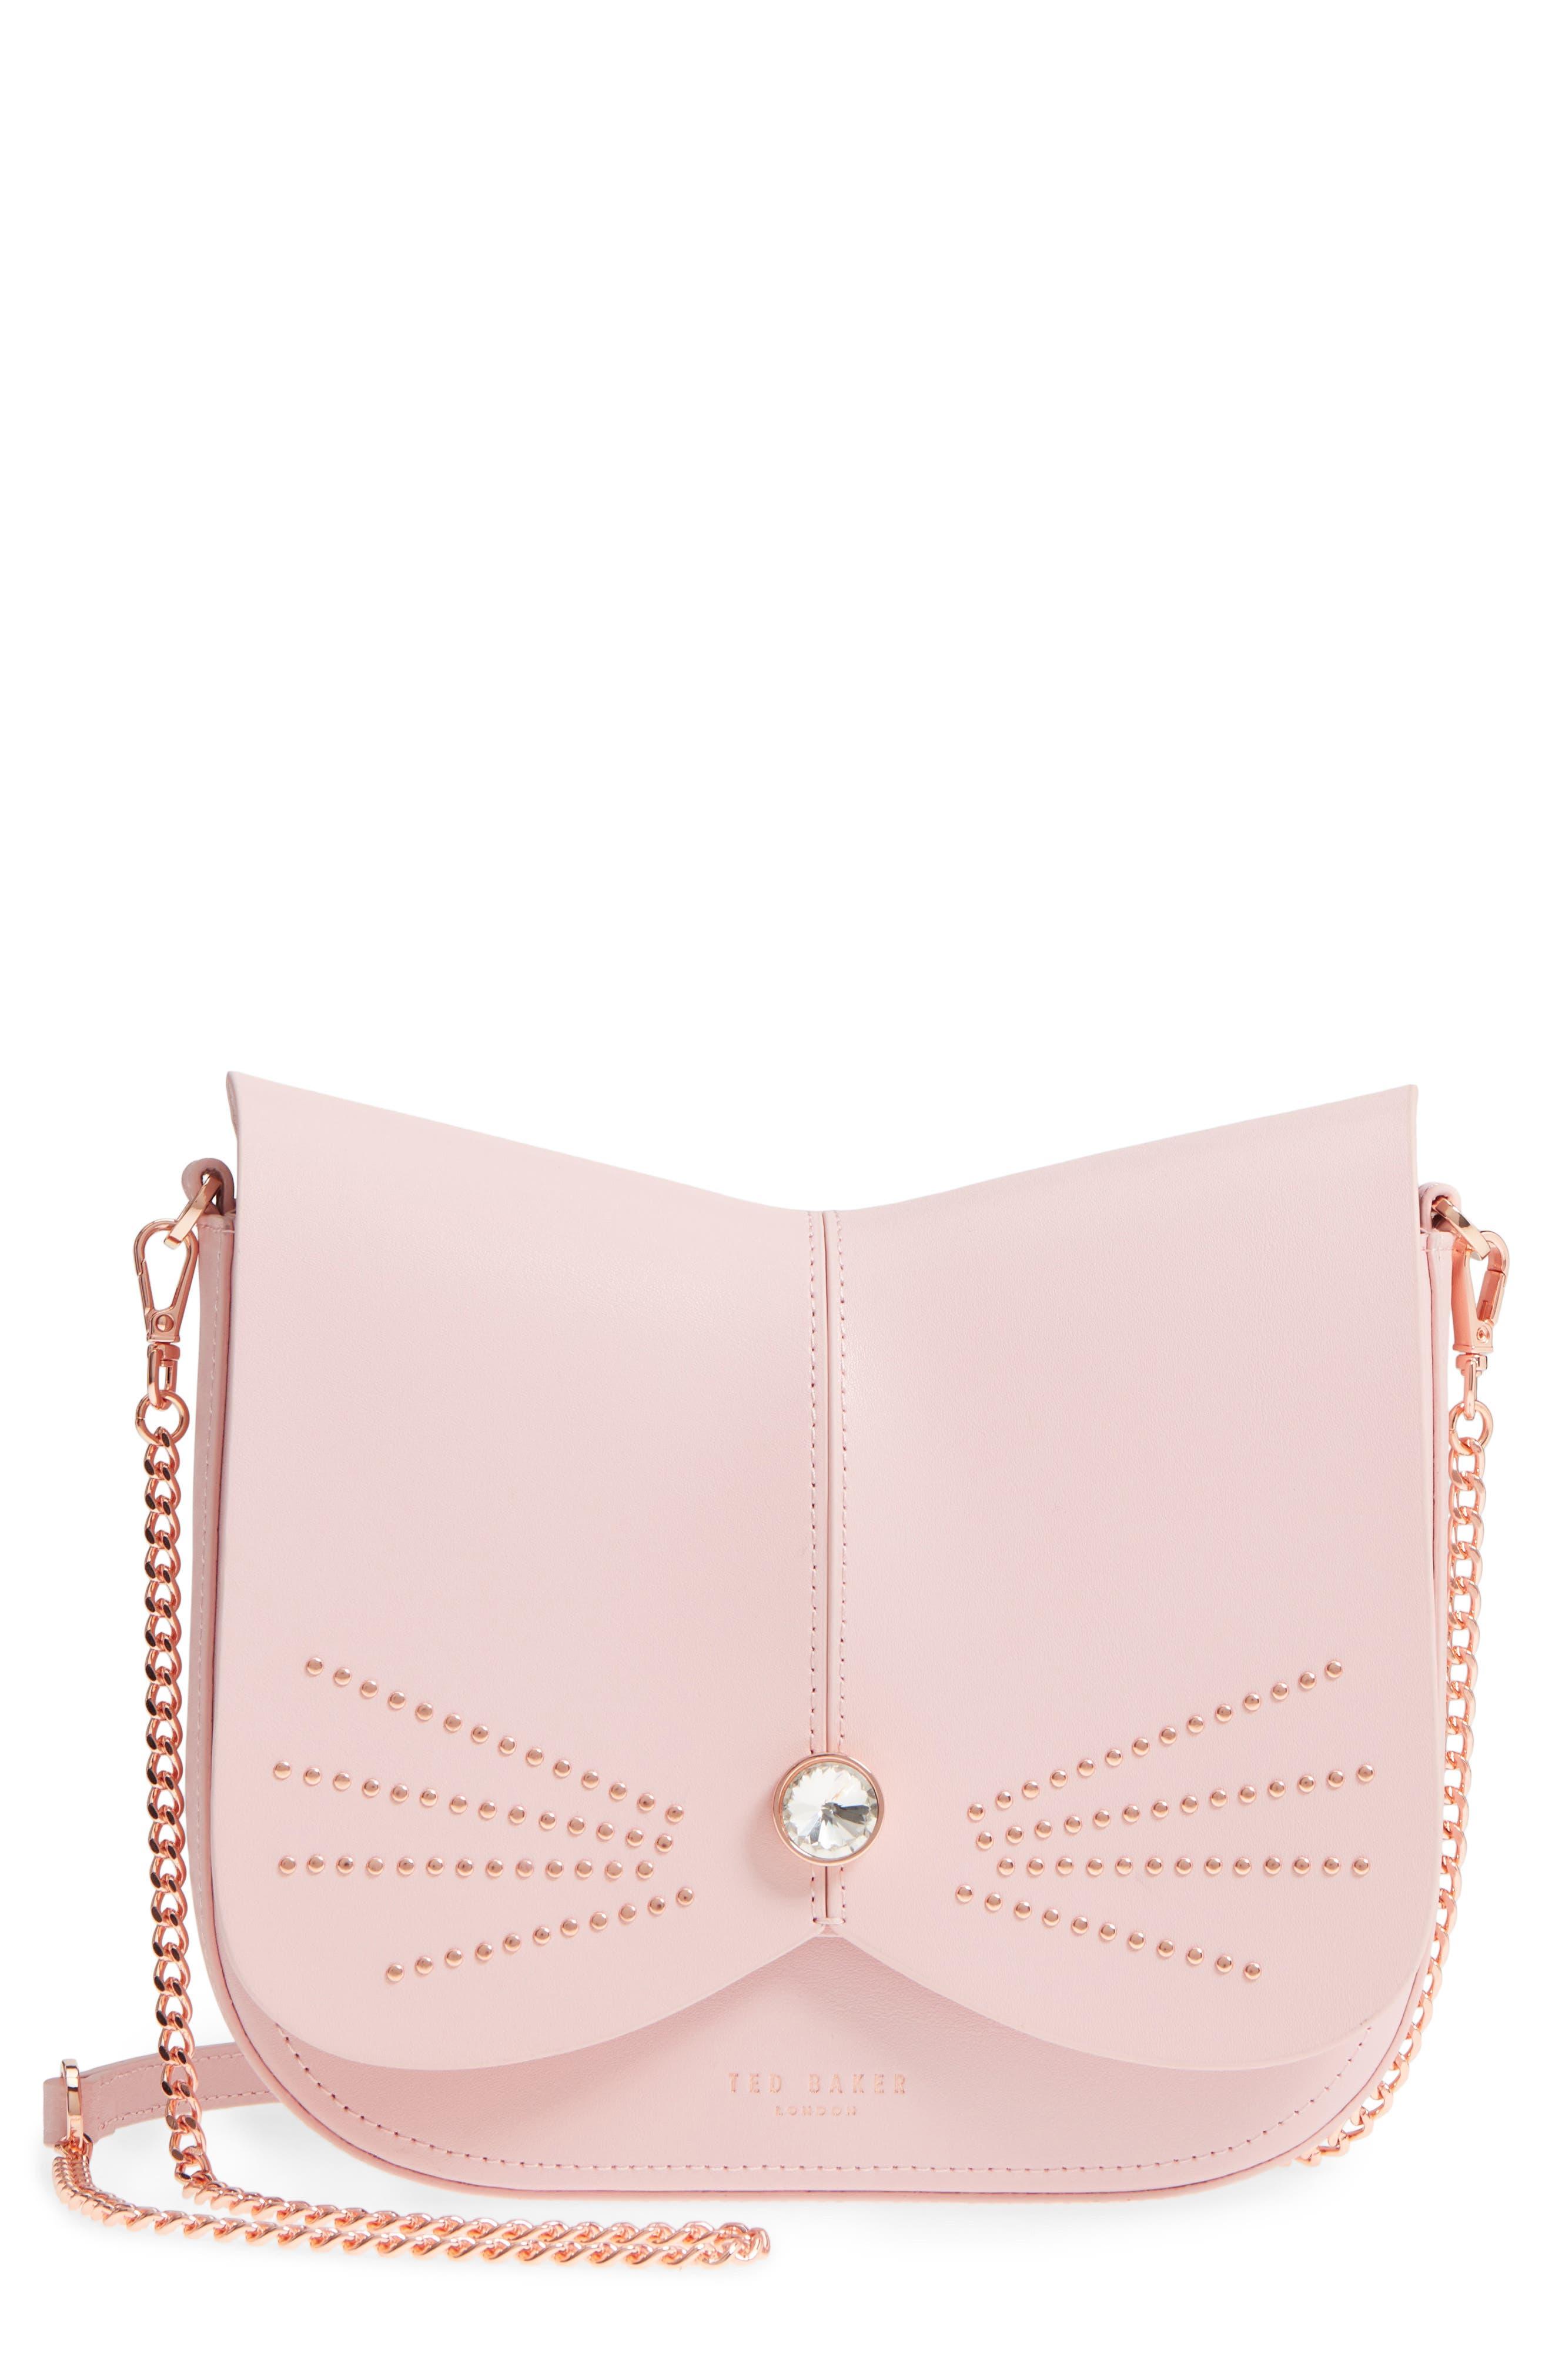 Chriiss Cat Stud Leather Crossbody Bag,                             Main thumbnail 1, color,                             Light Pink